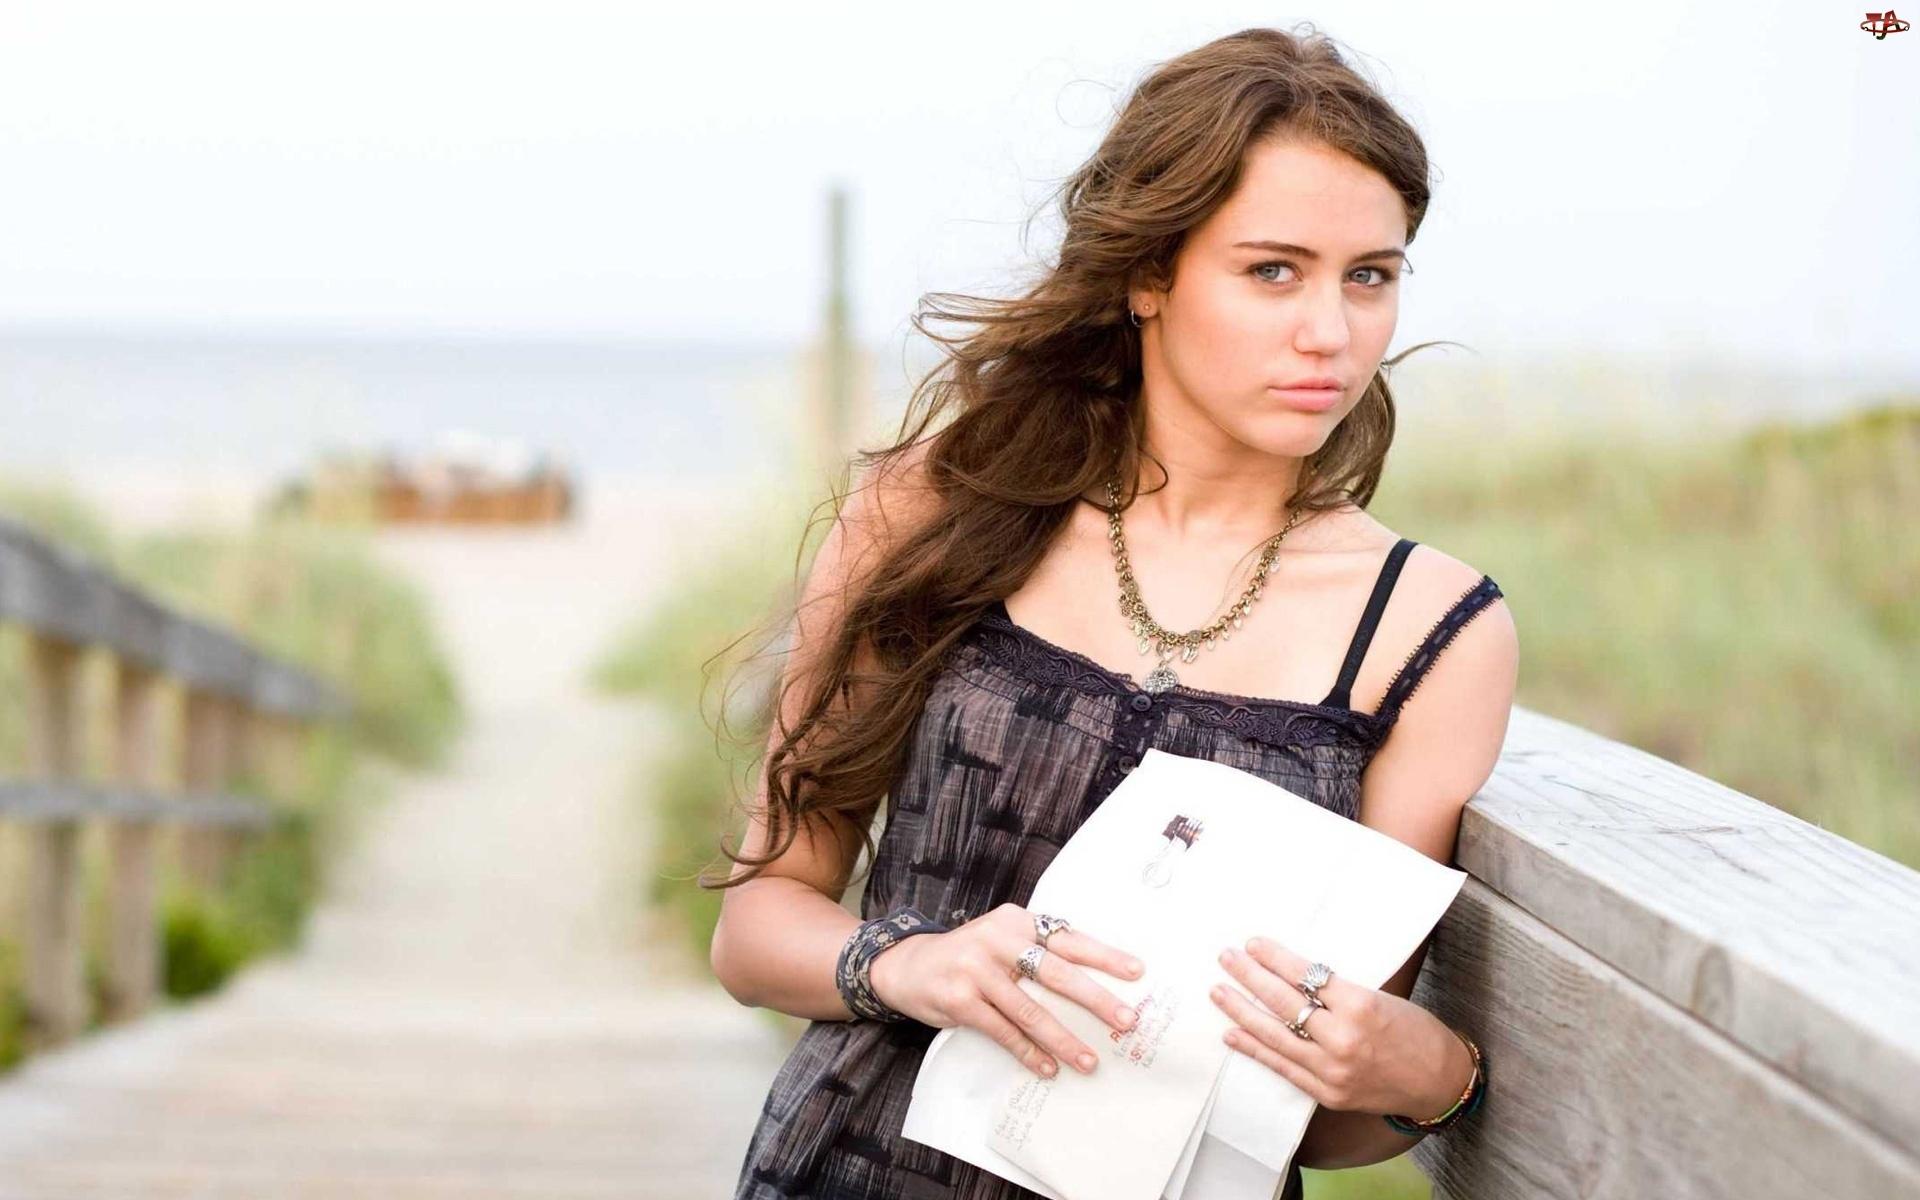 Piosenkarka, Miley Cyrus